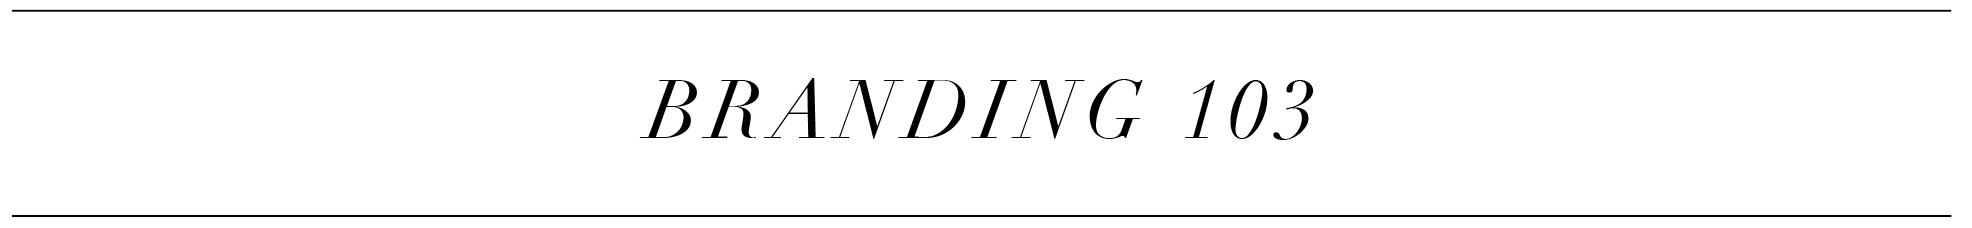 Branding 103 Title.png